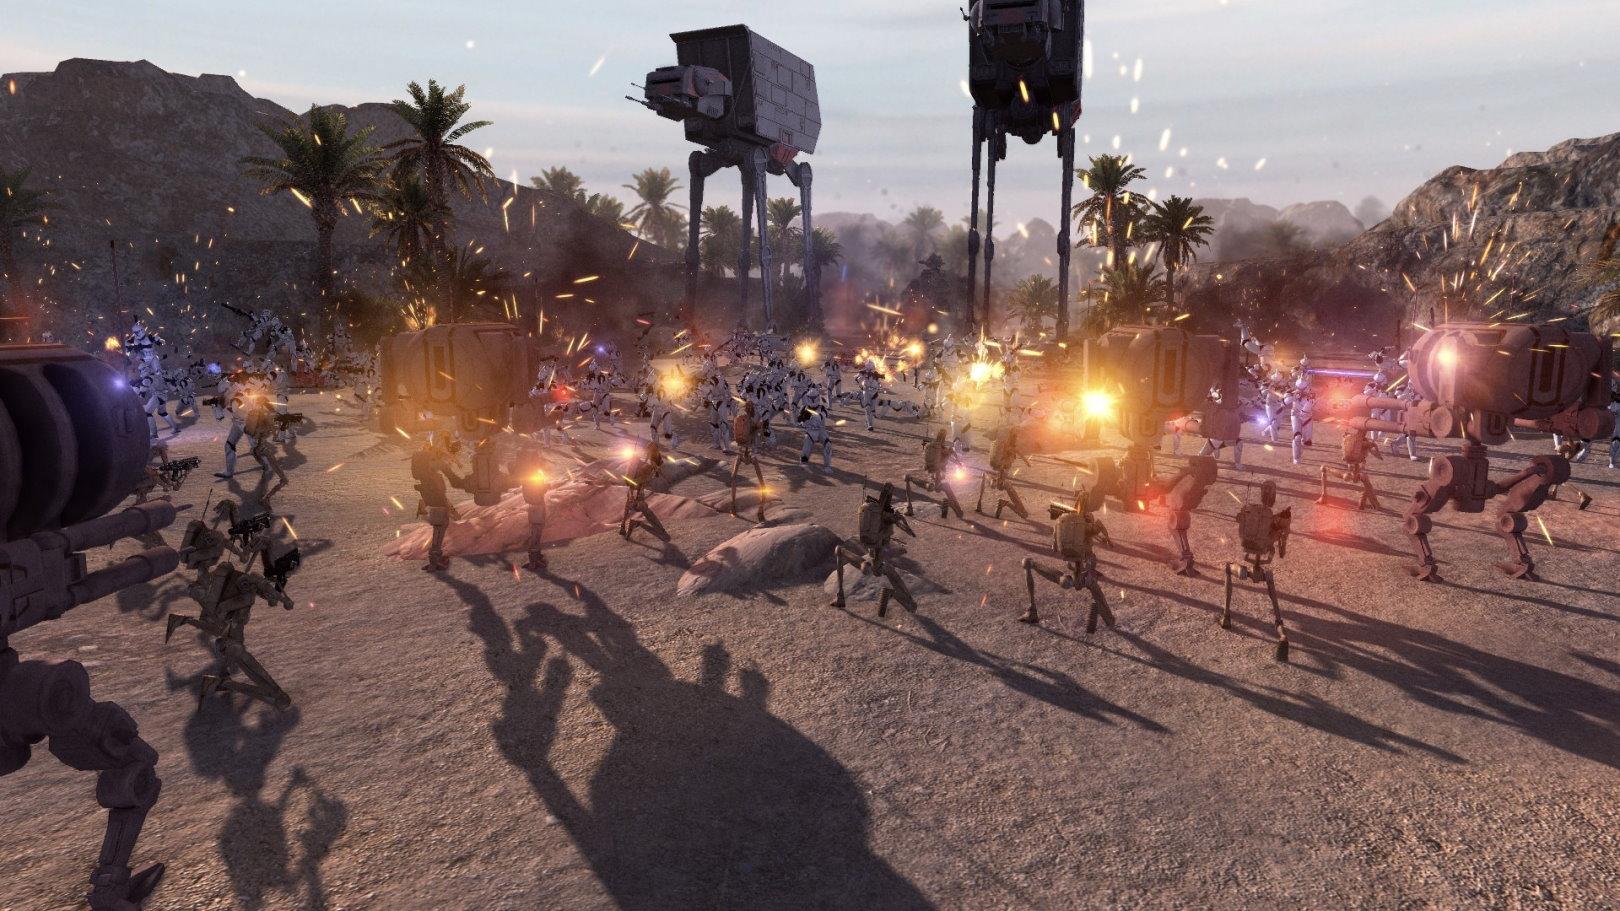 ASV The Ultimate Star Wars 1.0.12.48 (AS2 — 3.262.0) (v23.09.2021)